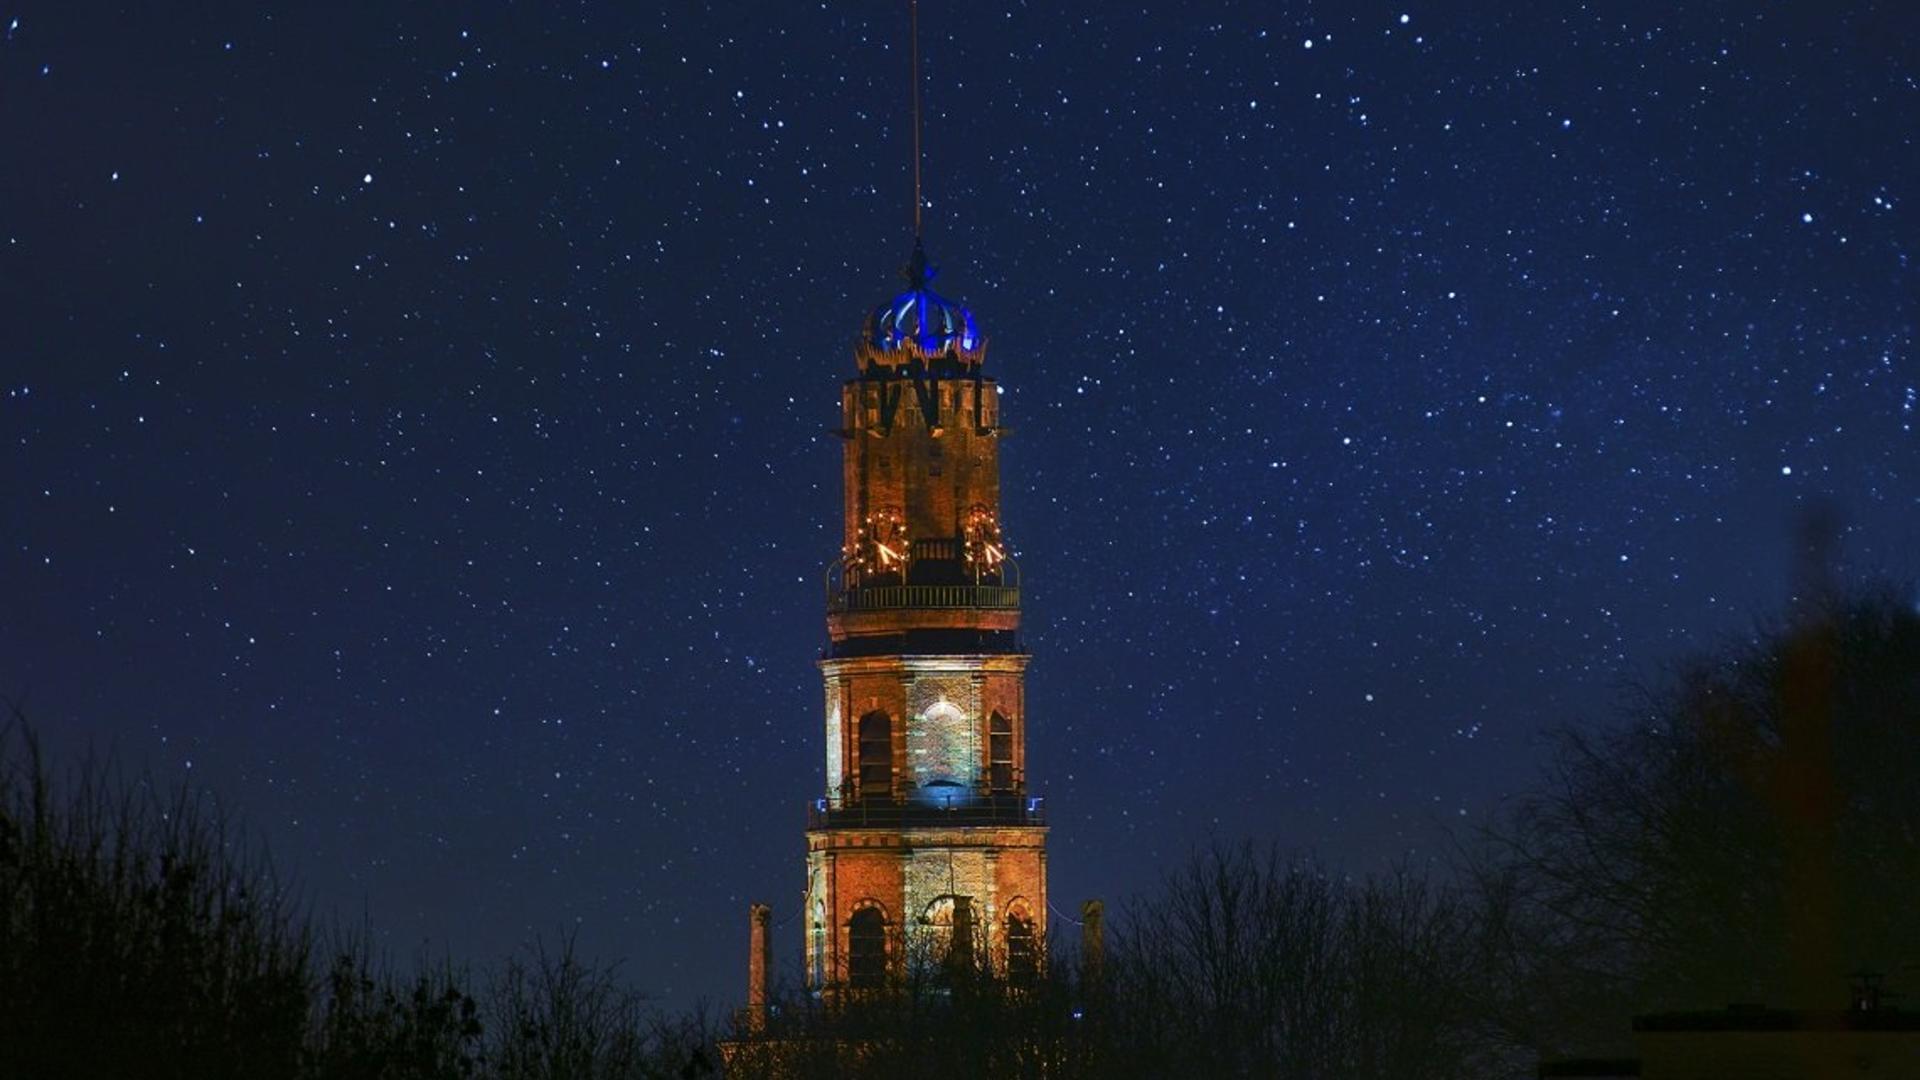 oude-nicolaaskerk-uitgelicht-mohammad-bakhash-.jpg